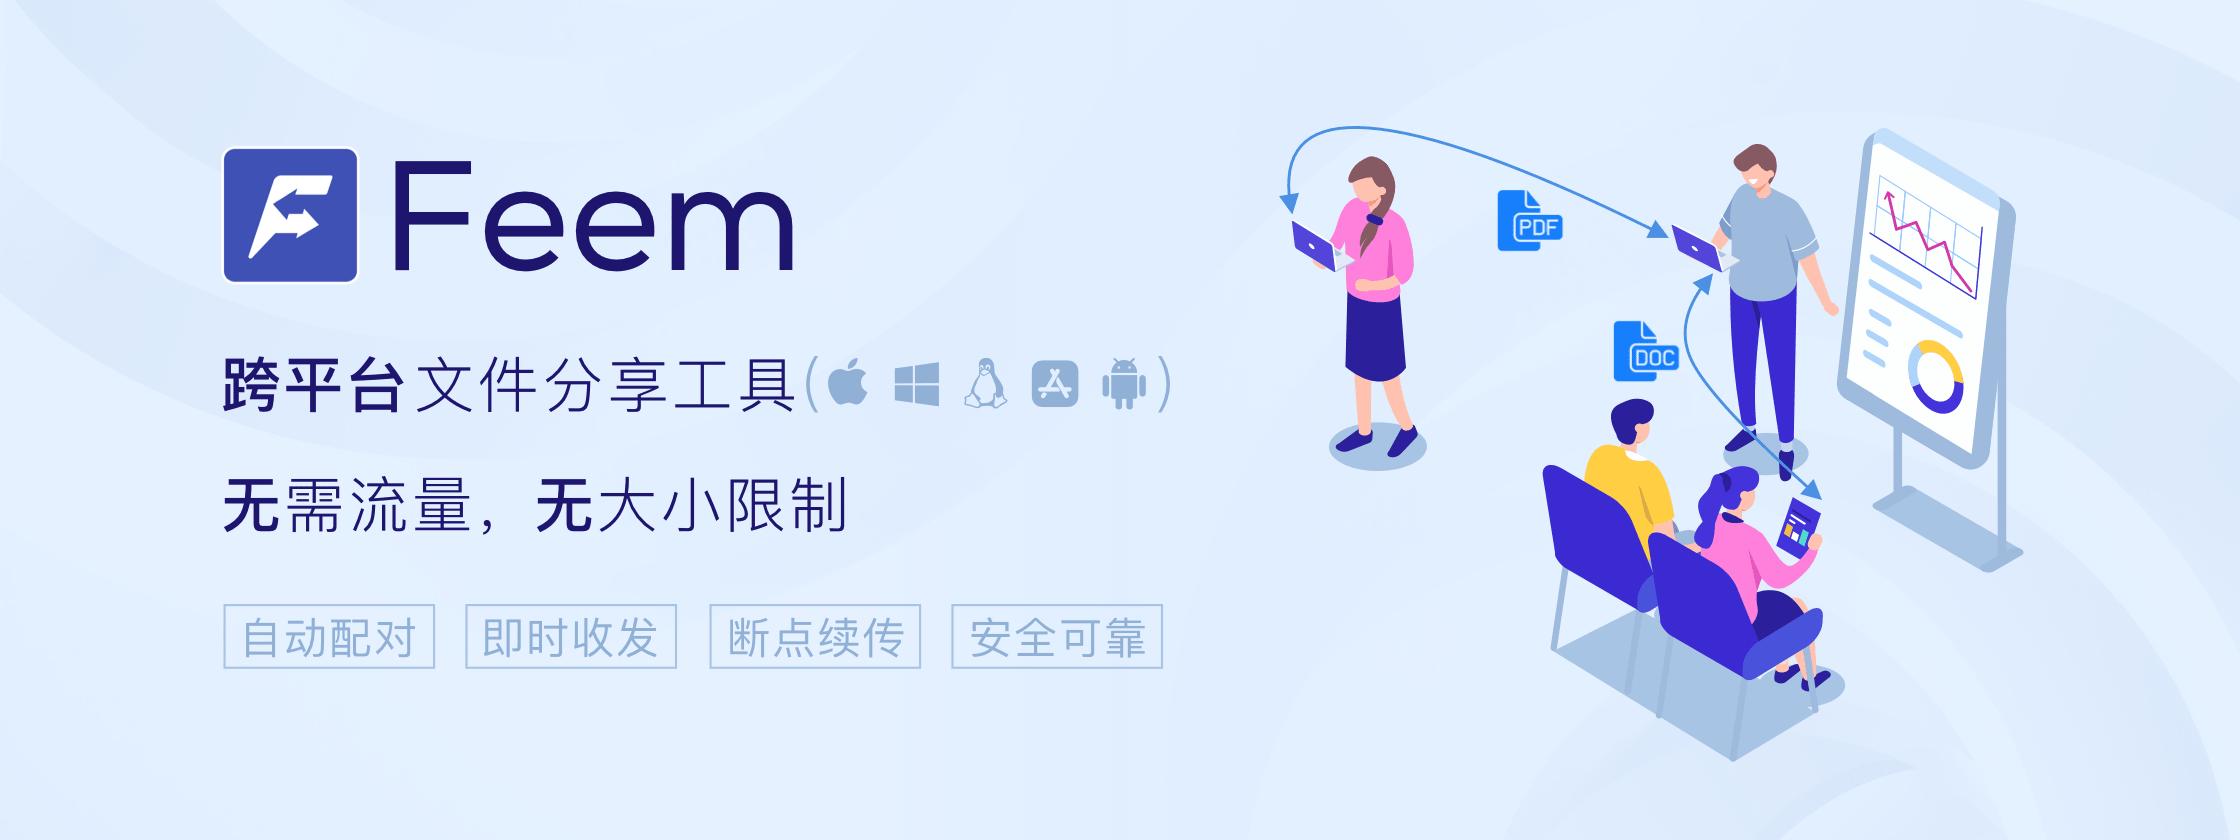 Feem – 无需流量的跨平台文件分享工具